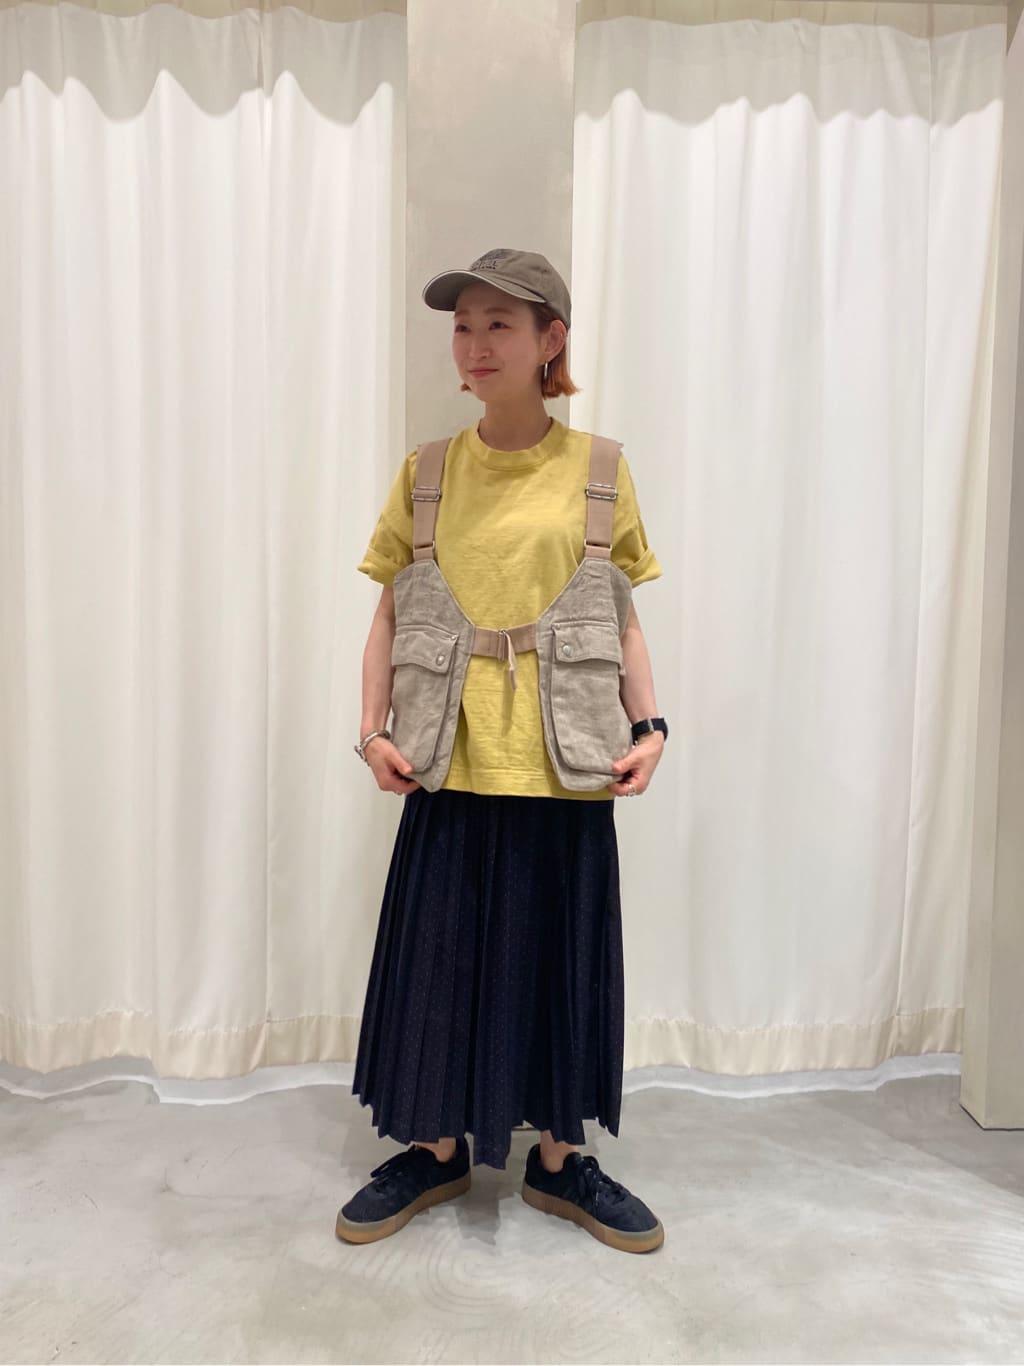 - CHILD WOMAN CHILD WOMAN , PAR ICI 東京スカイツリータウン・ソラマチ 身長:150cm 2021.06.28